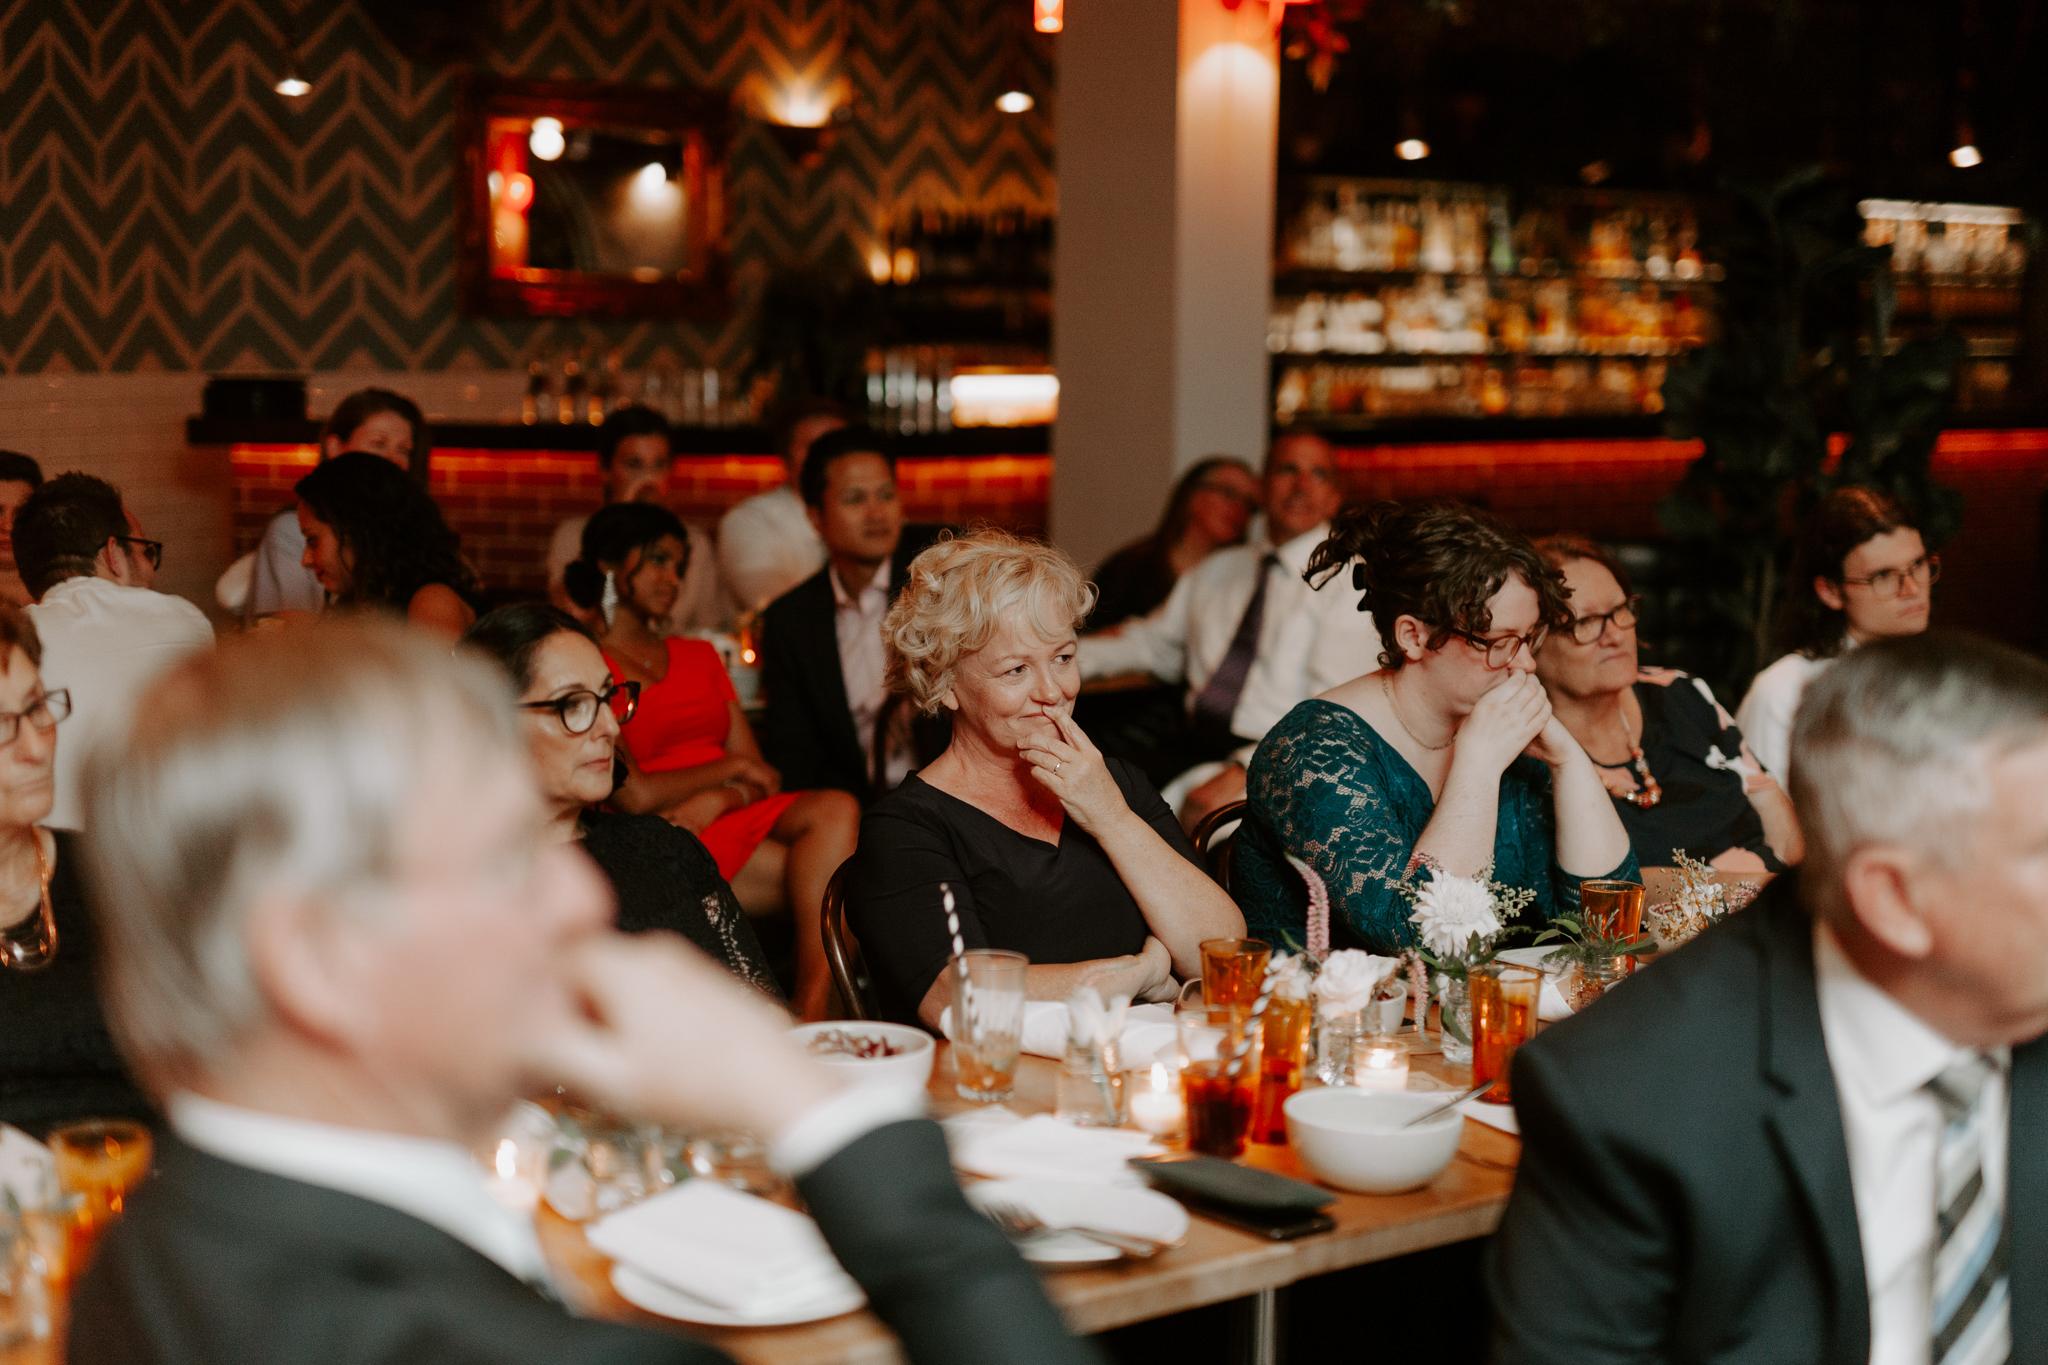 Panama-Dining-Room-wedding-emotionsandmath-049.jpg